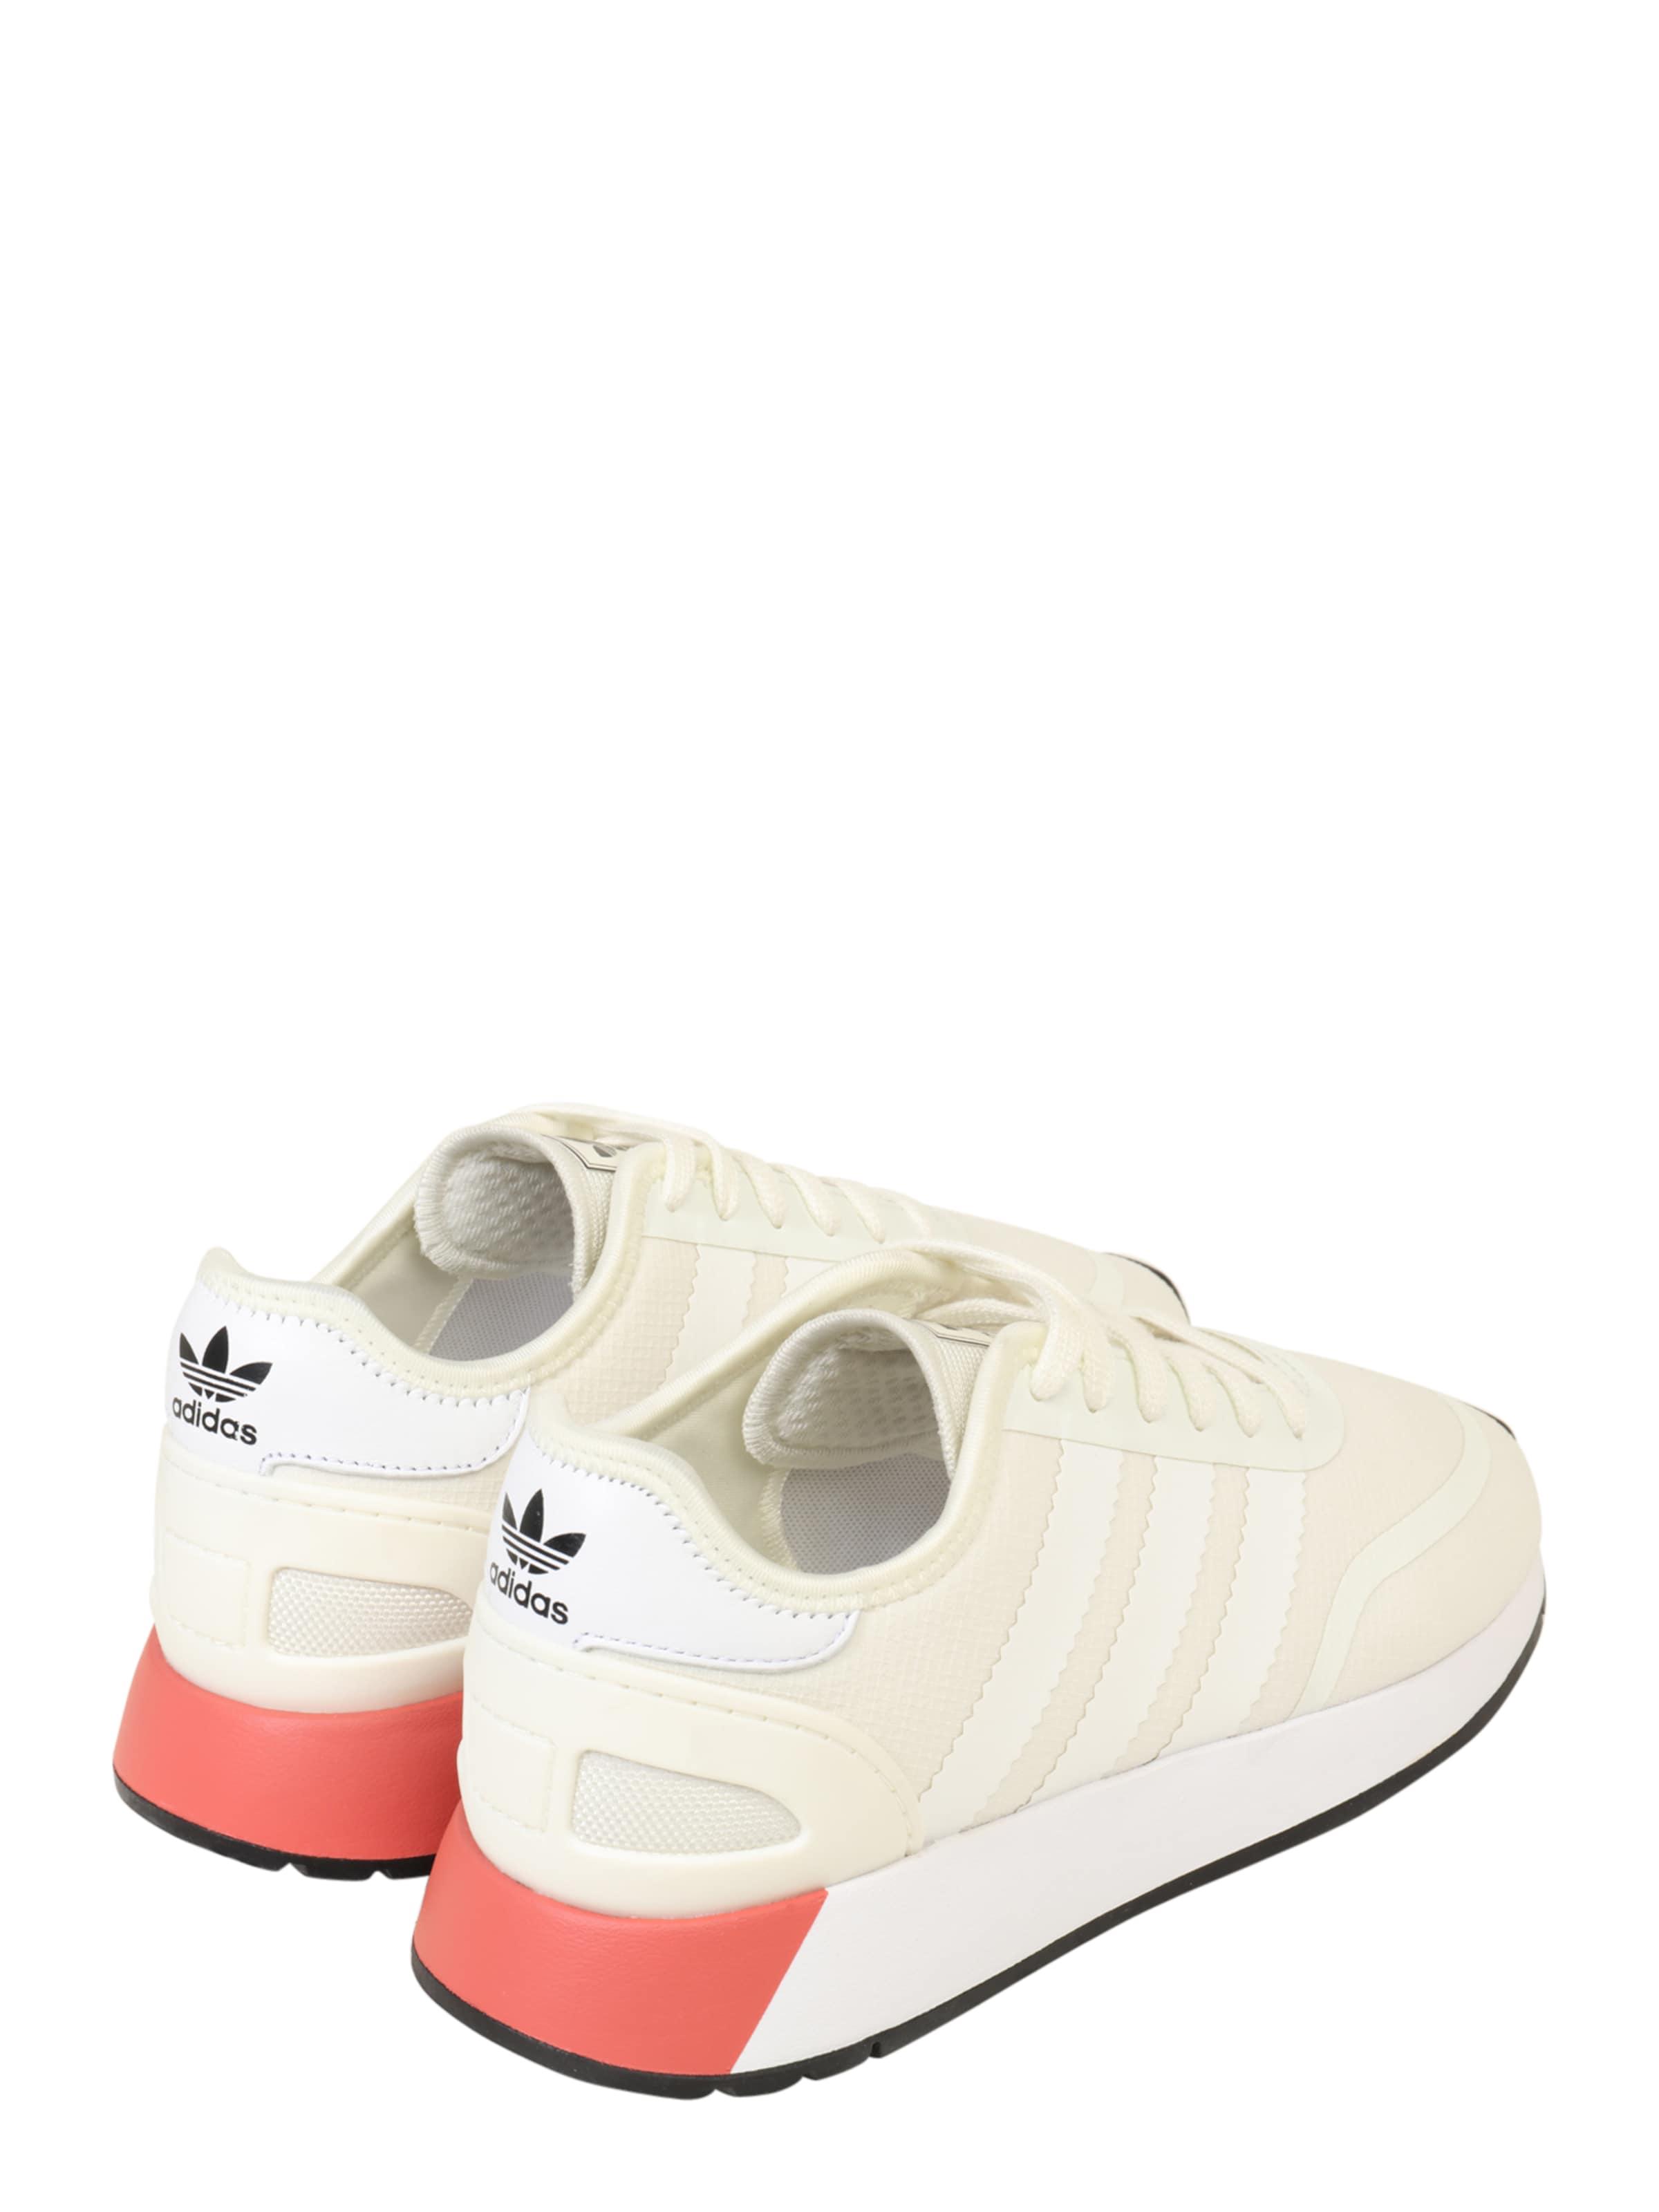 Baskets Adidas En Cassé Basses Originals Blanc 8w0nvNmO